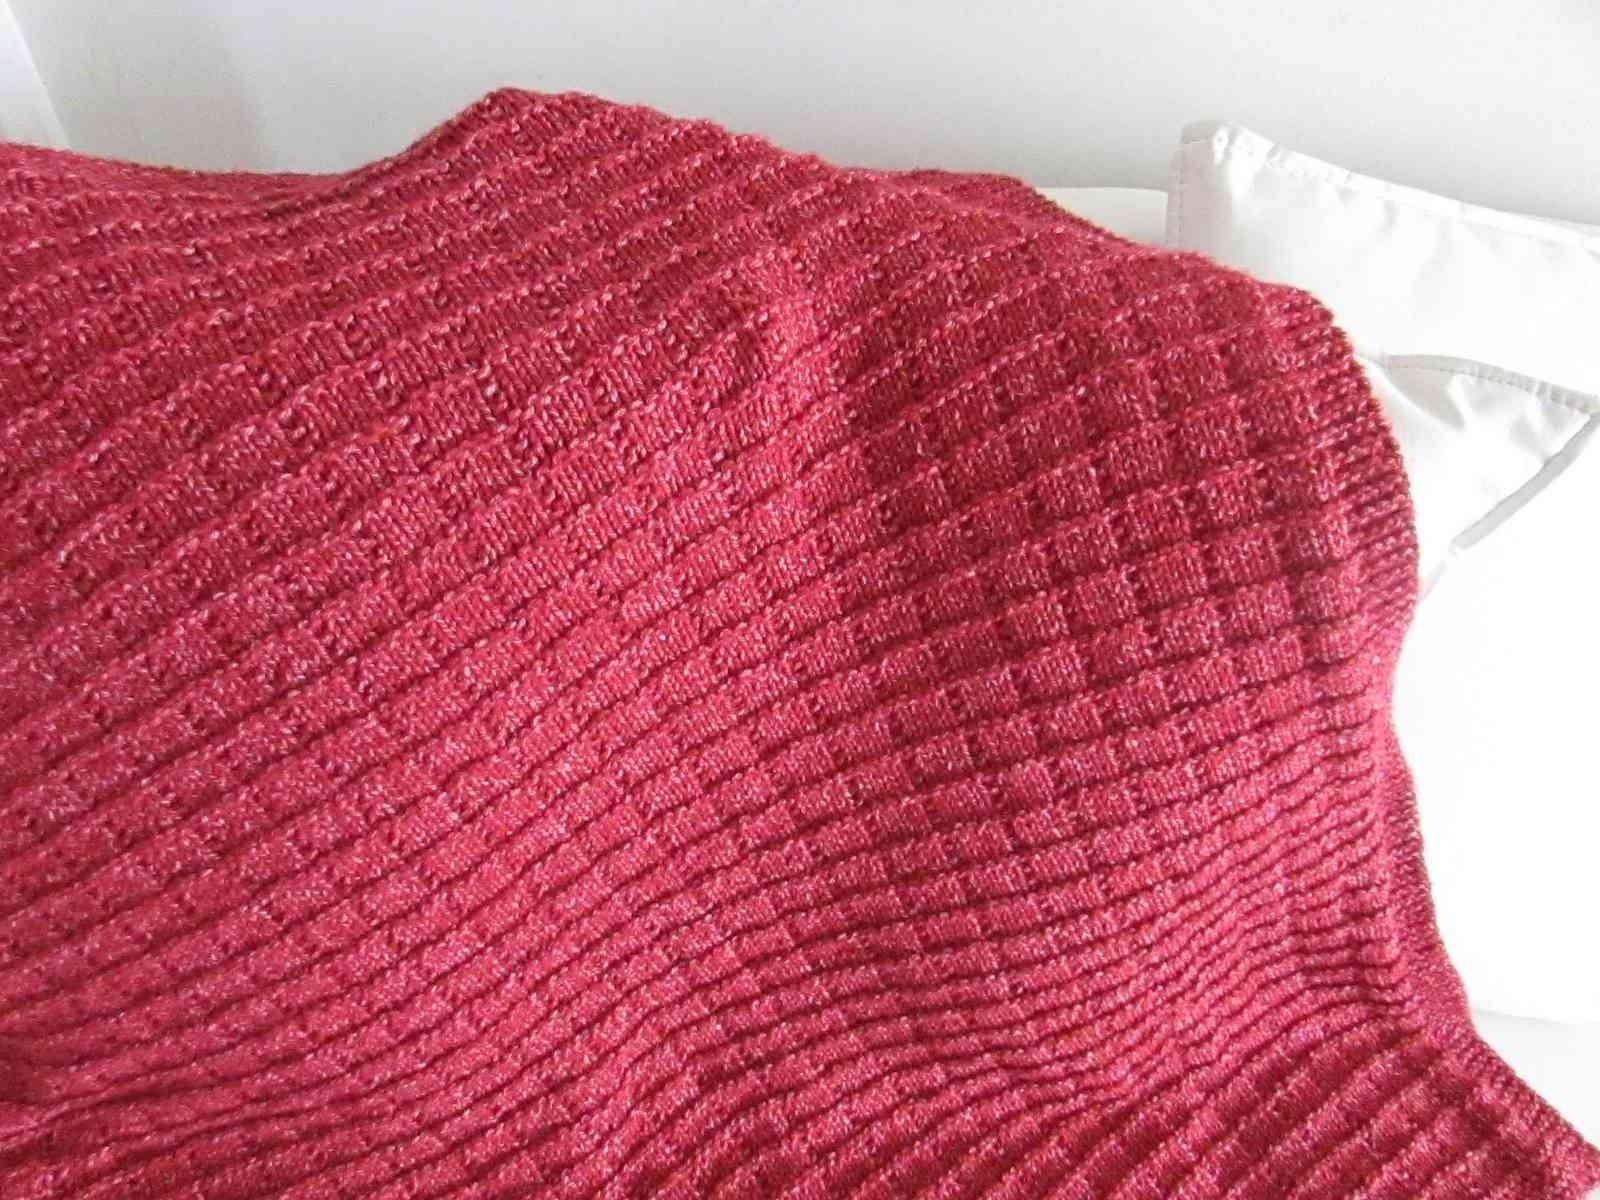 Becker Throw Knitting Pattern